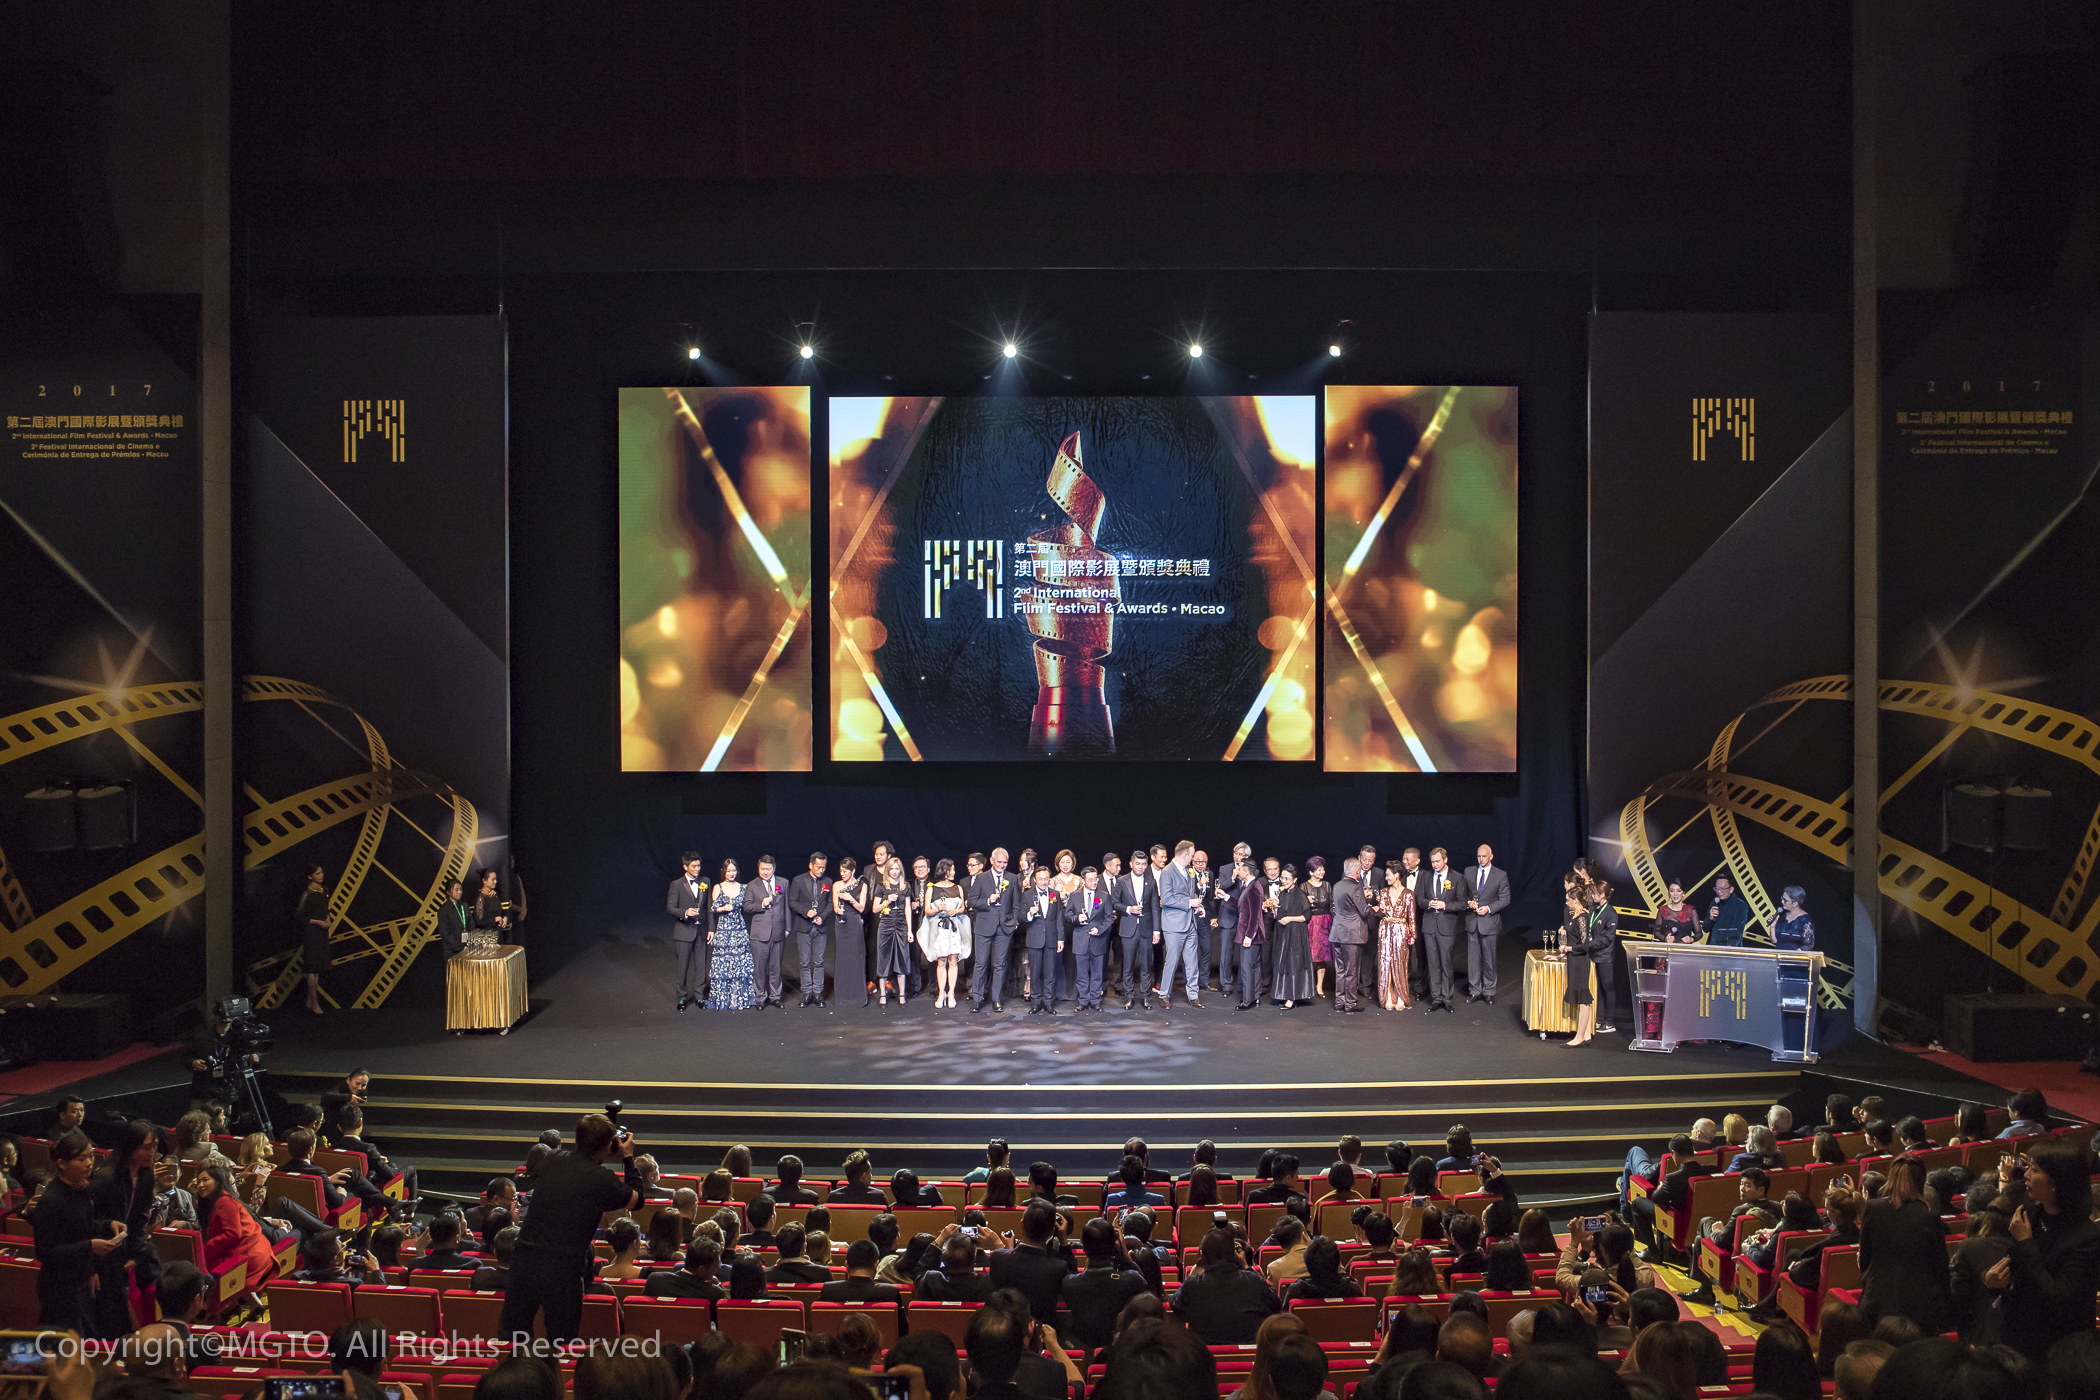 MGTO_4th International Film Festival & Awards